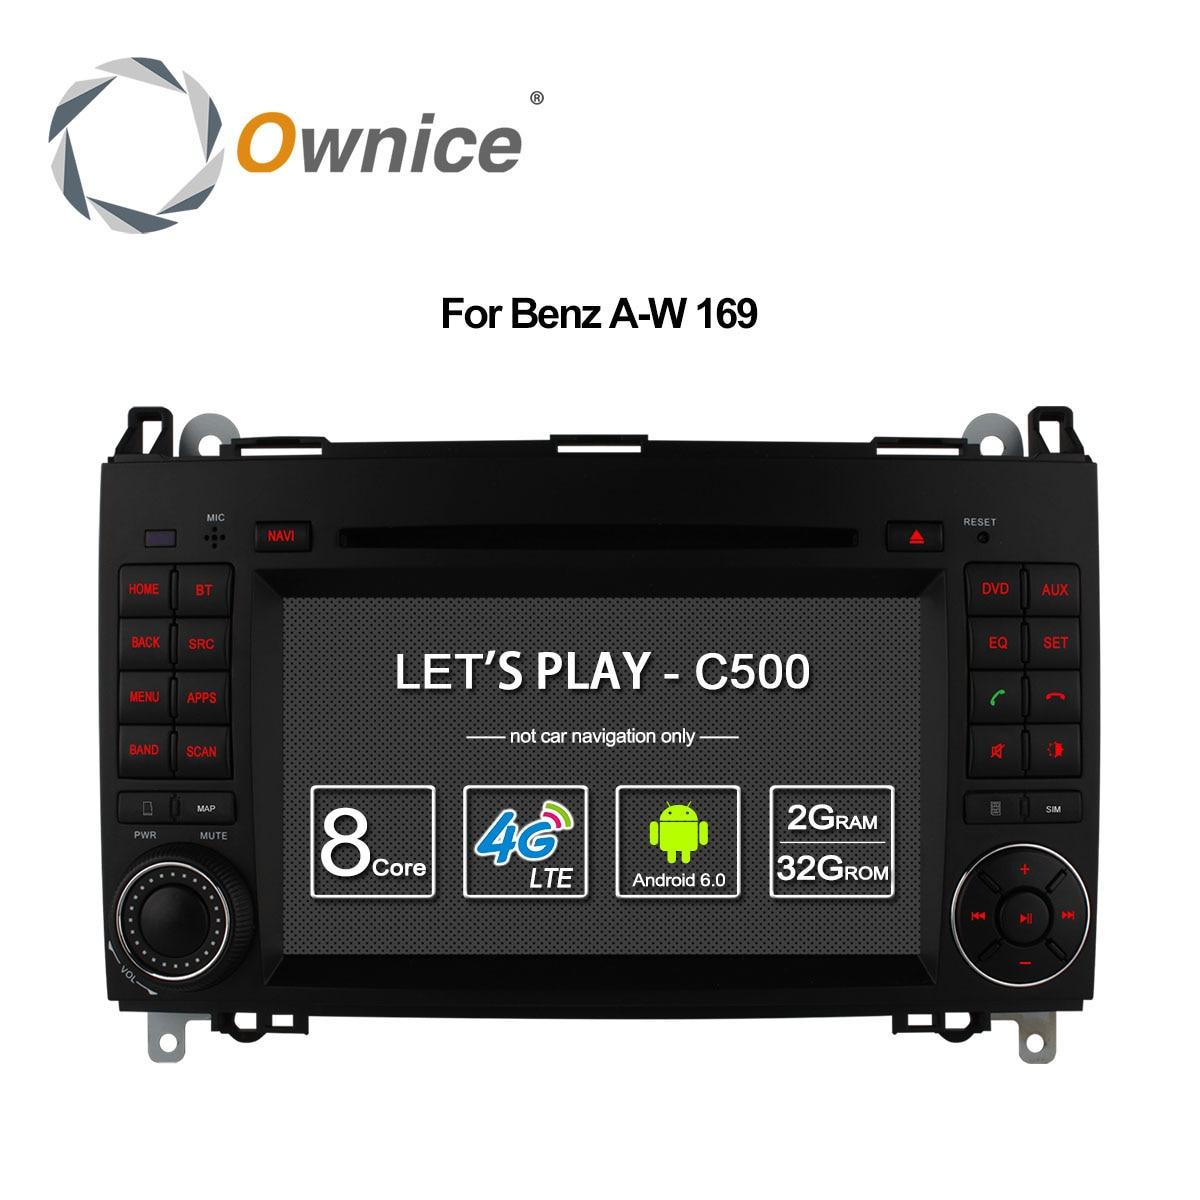 Ownice 4 г SIM LTE Android6.0 8 core 32 г Встроенная память автомобильный DVD GPS Navi для Mercedes-класс w169 Sprinter W209 crafter Viano Vito LT3 W245